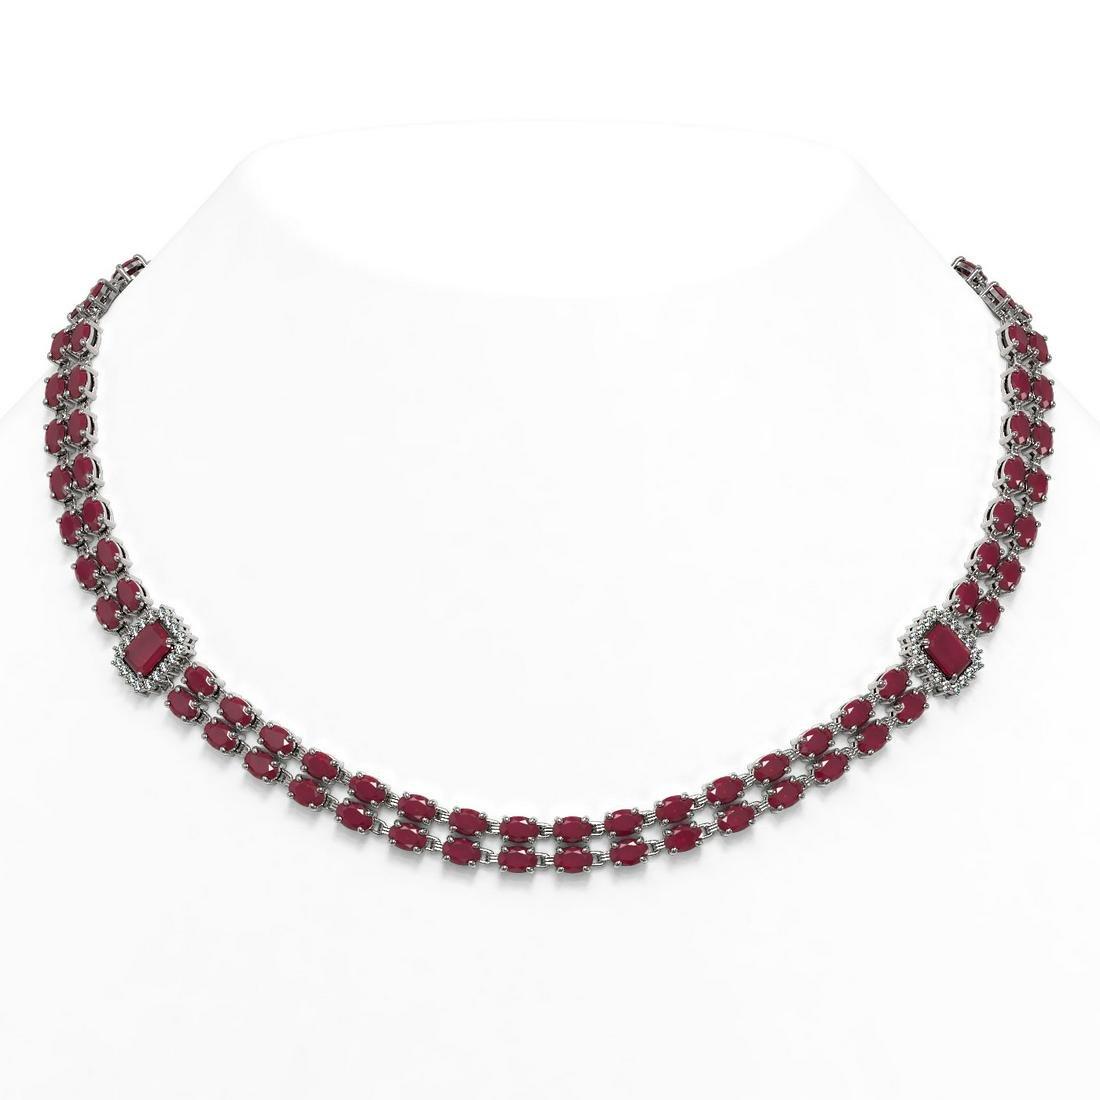 41.63 ctw Ruby & Diamond Necklace 14K White Gold